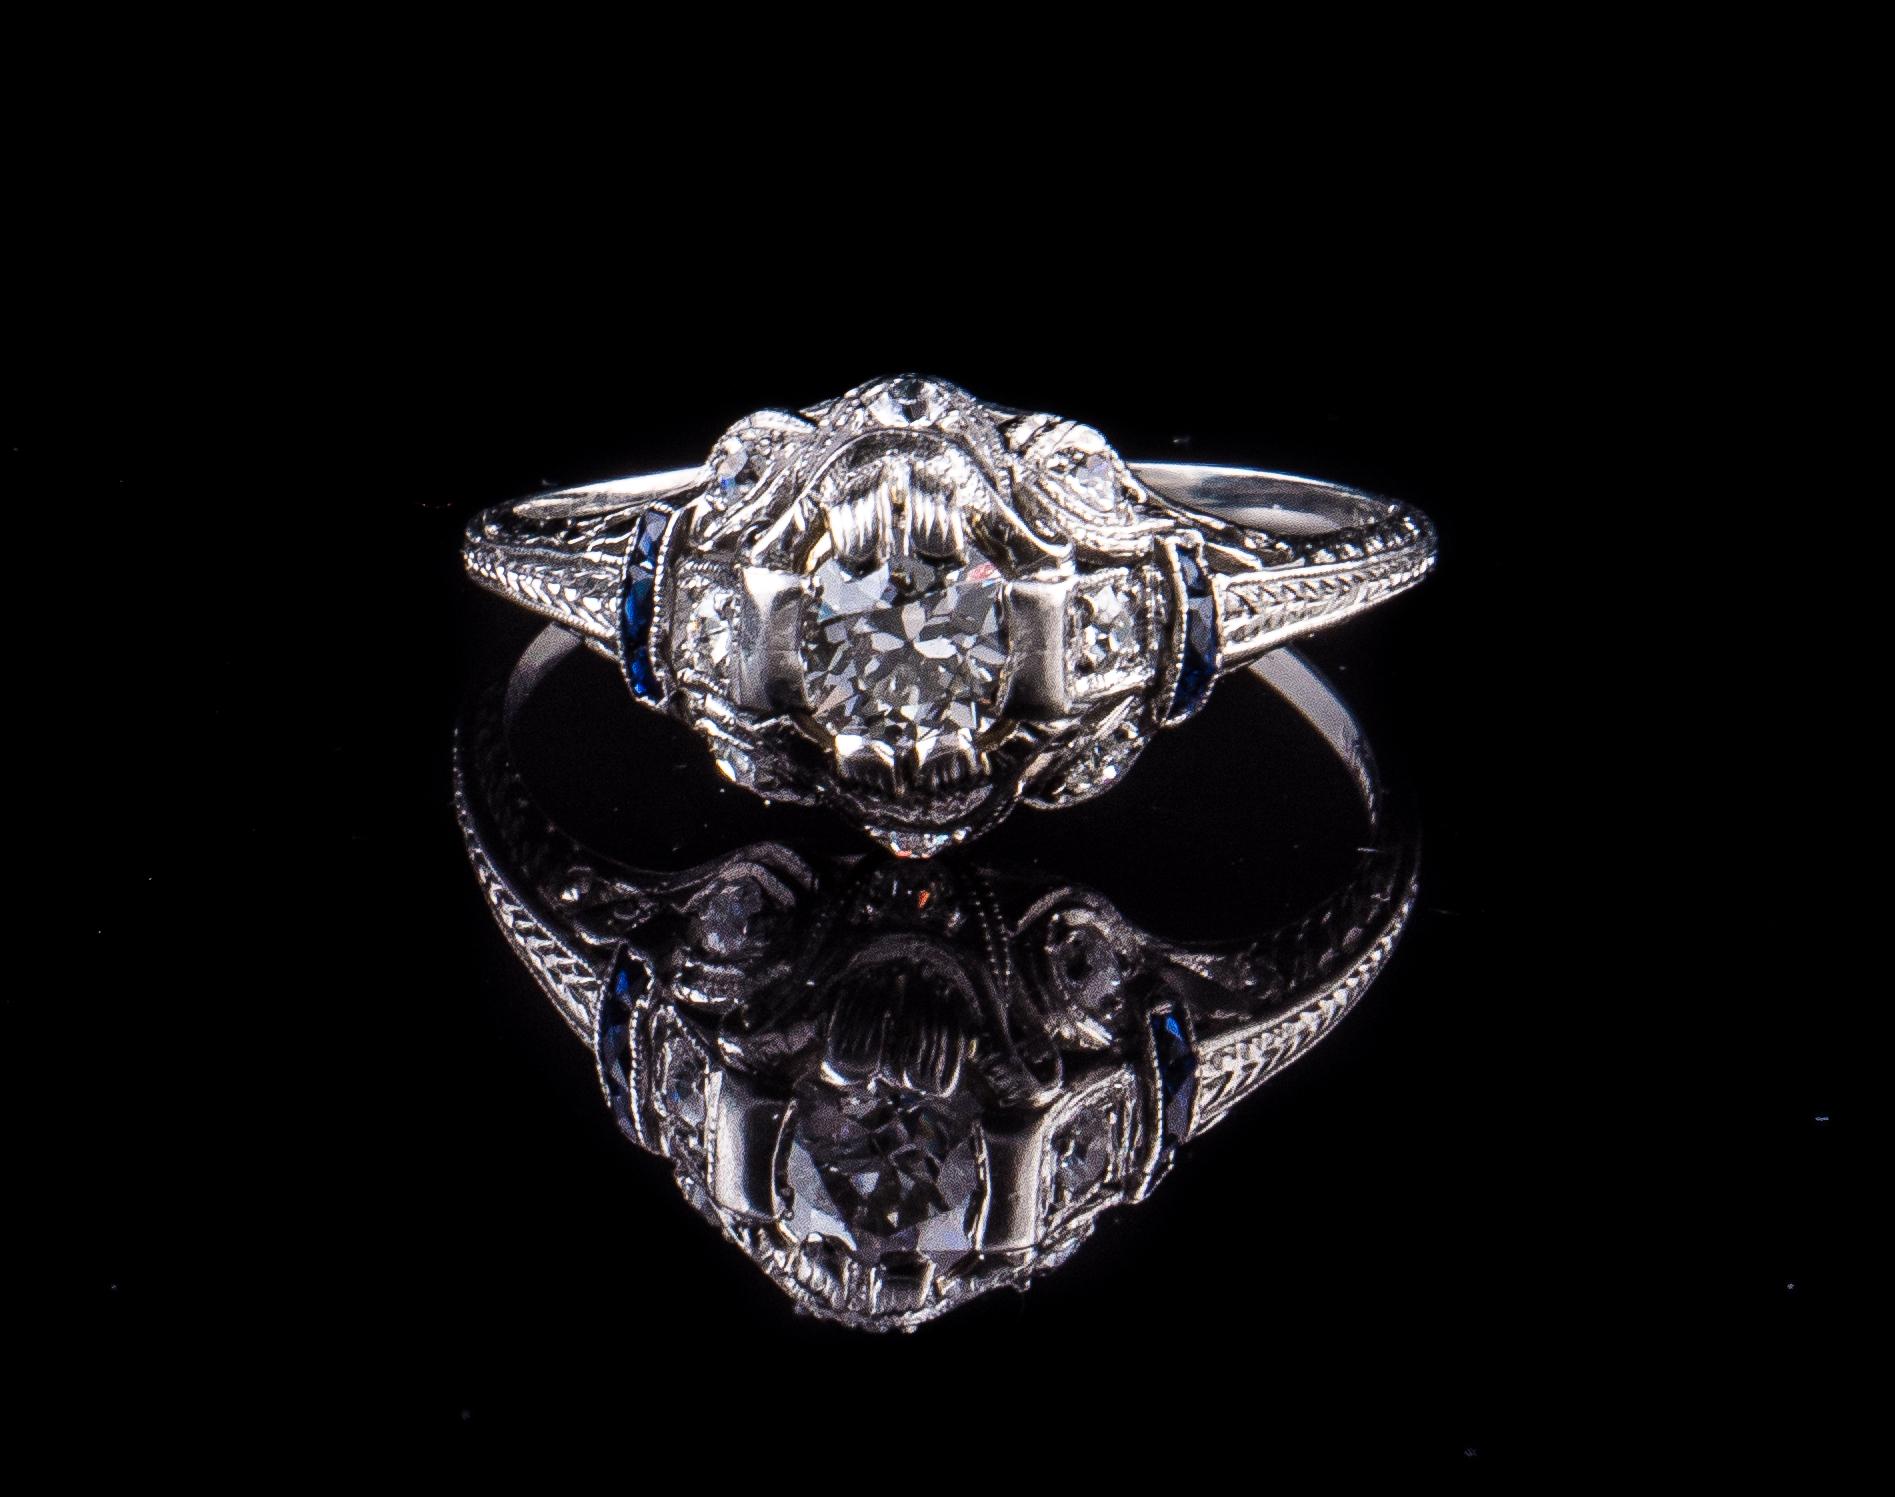 18Kt engagement ring